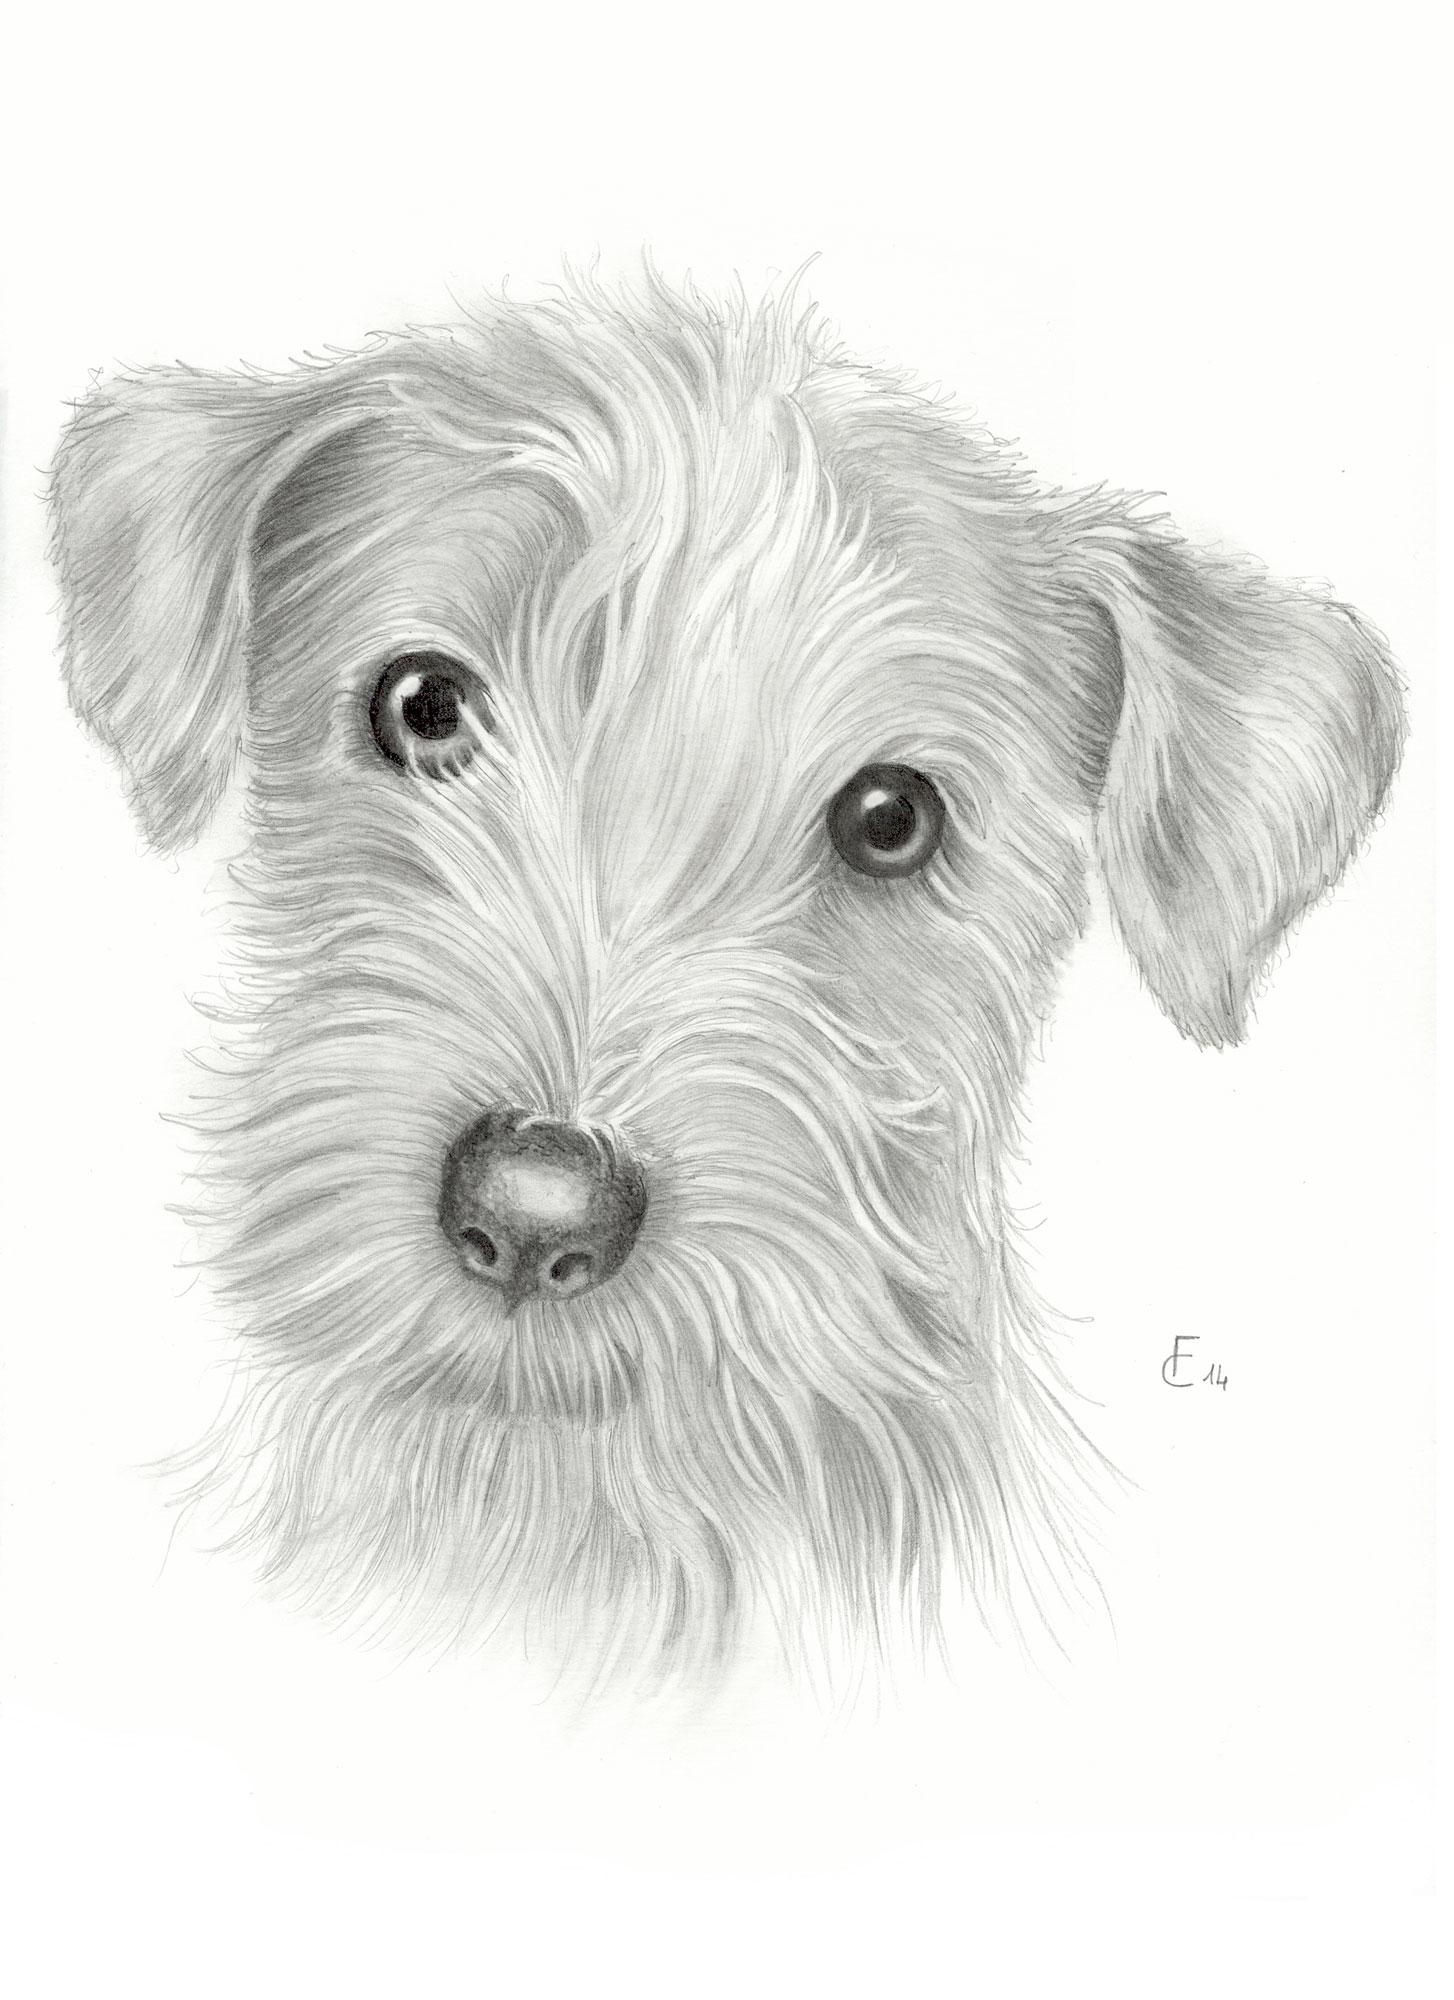 Disegni a matita di animali for Disegni a matita di cani